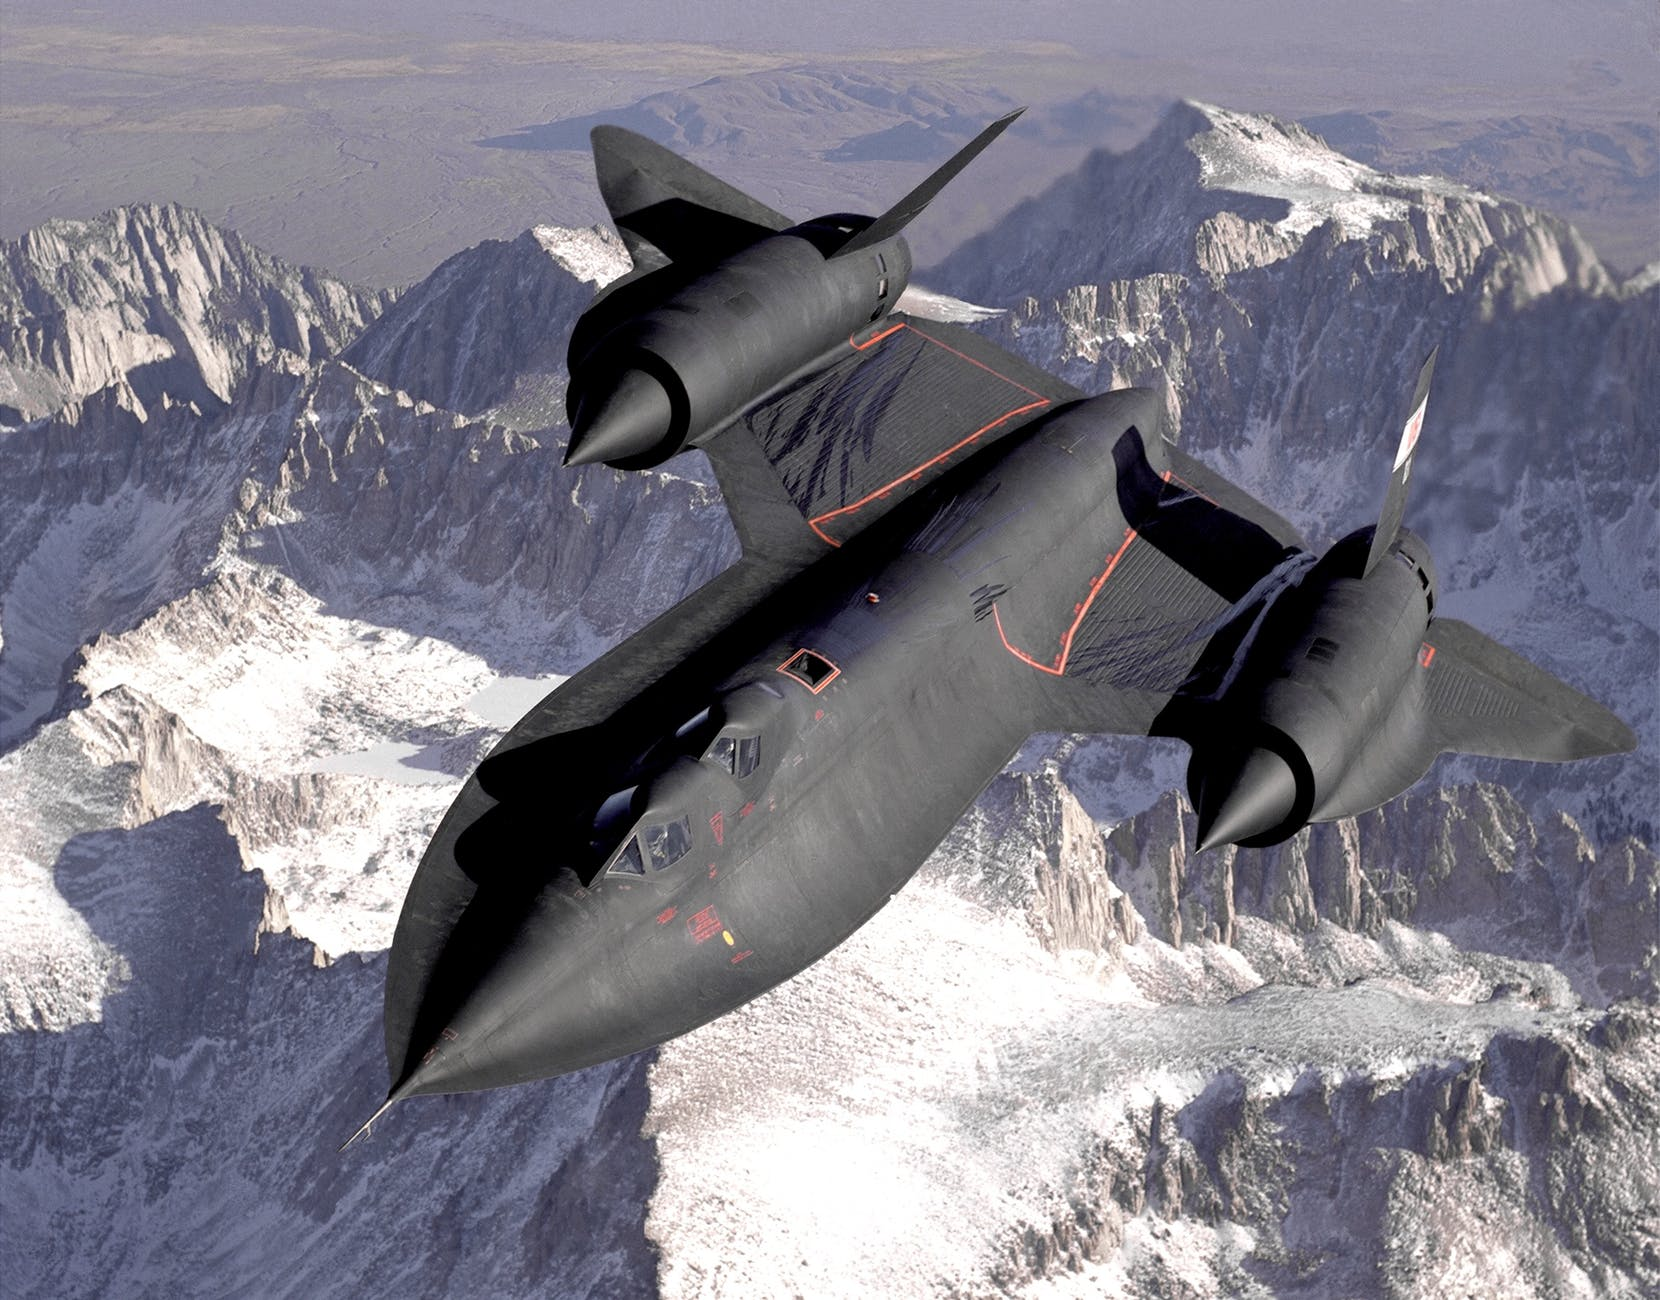 black jetplane flying on the sky